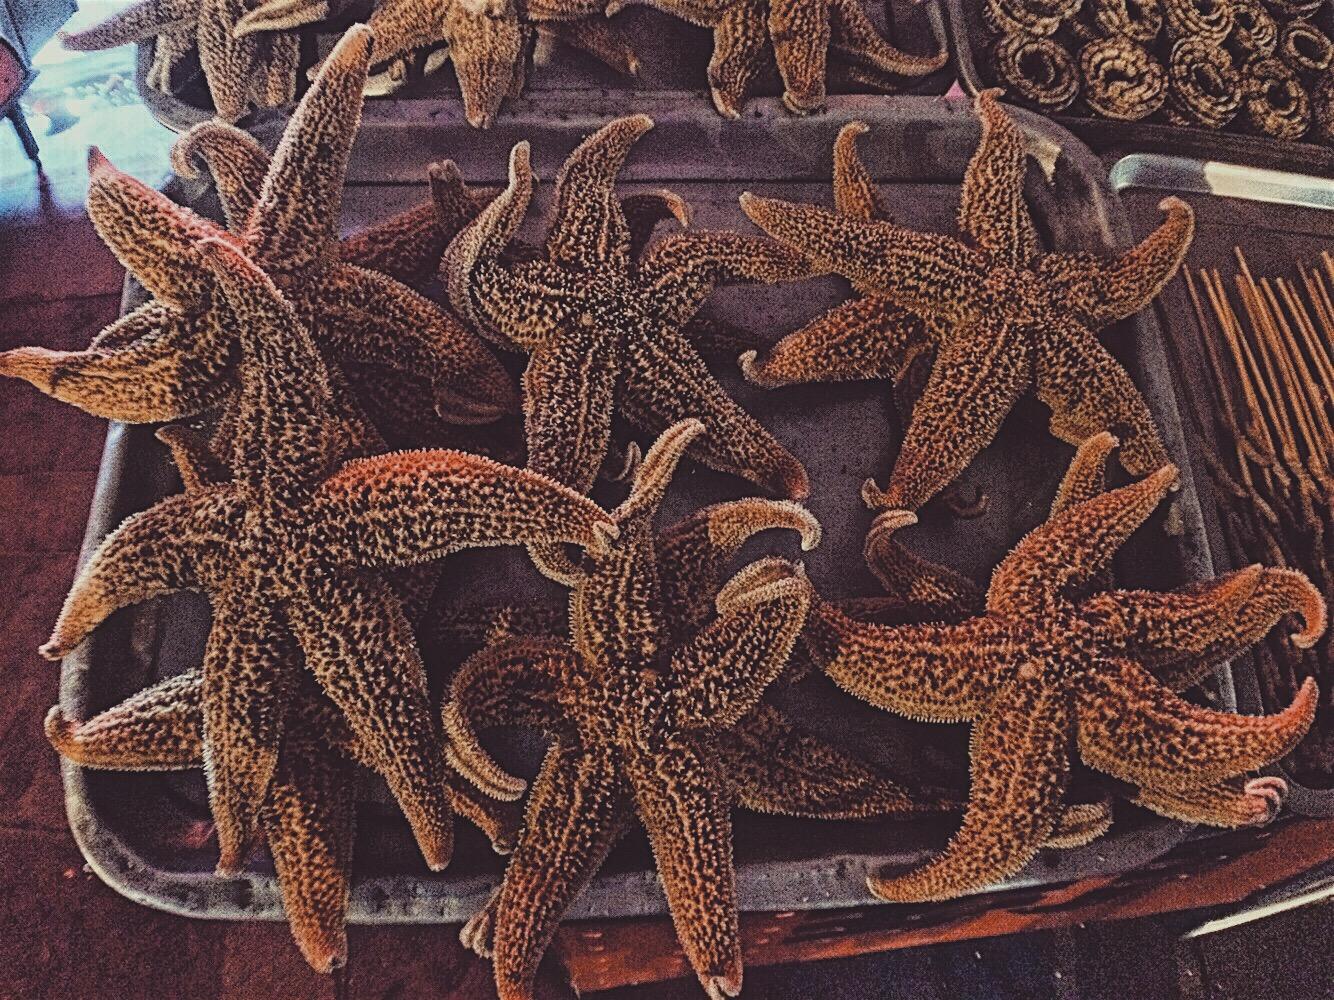 Starfish Wangfujing Snack Street